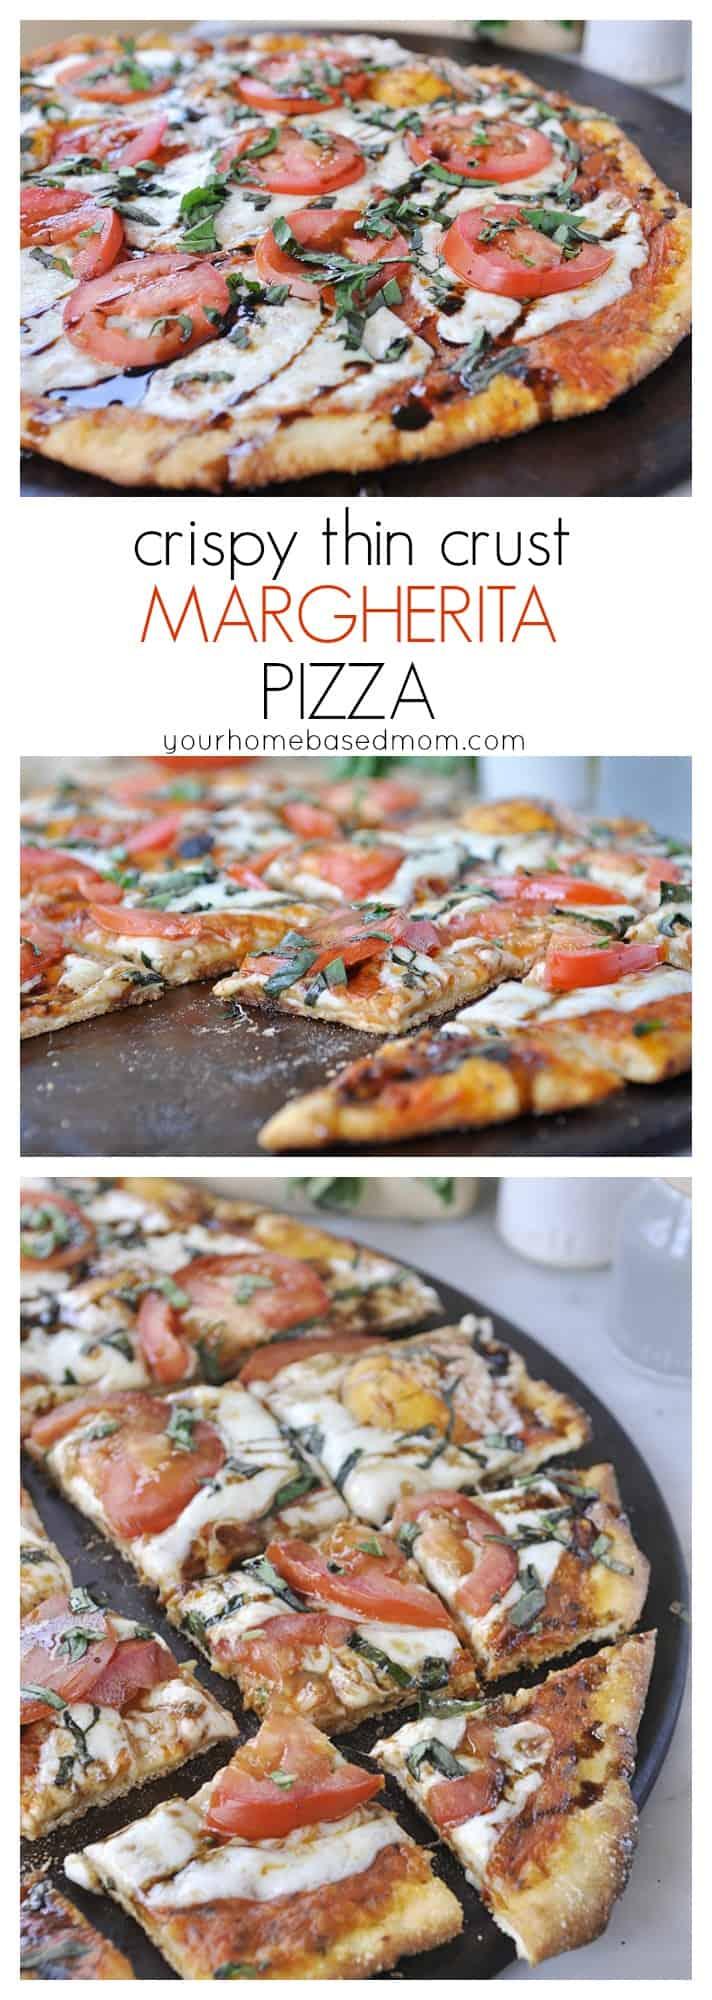 crispy thin crust margherita pizza